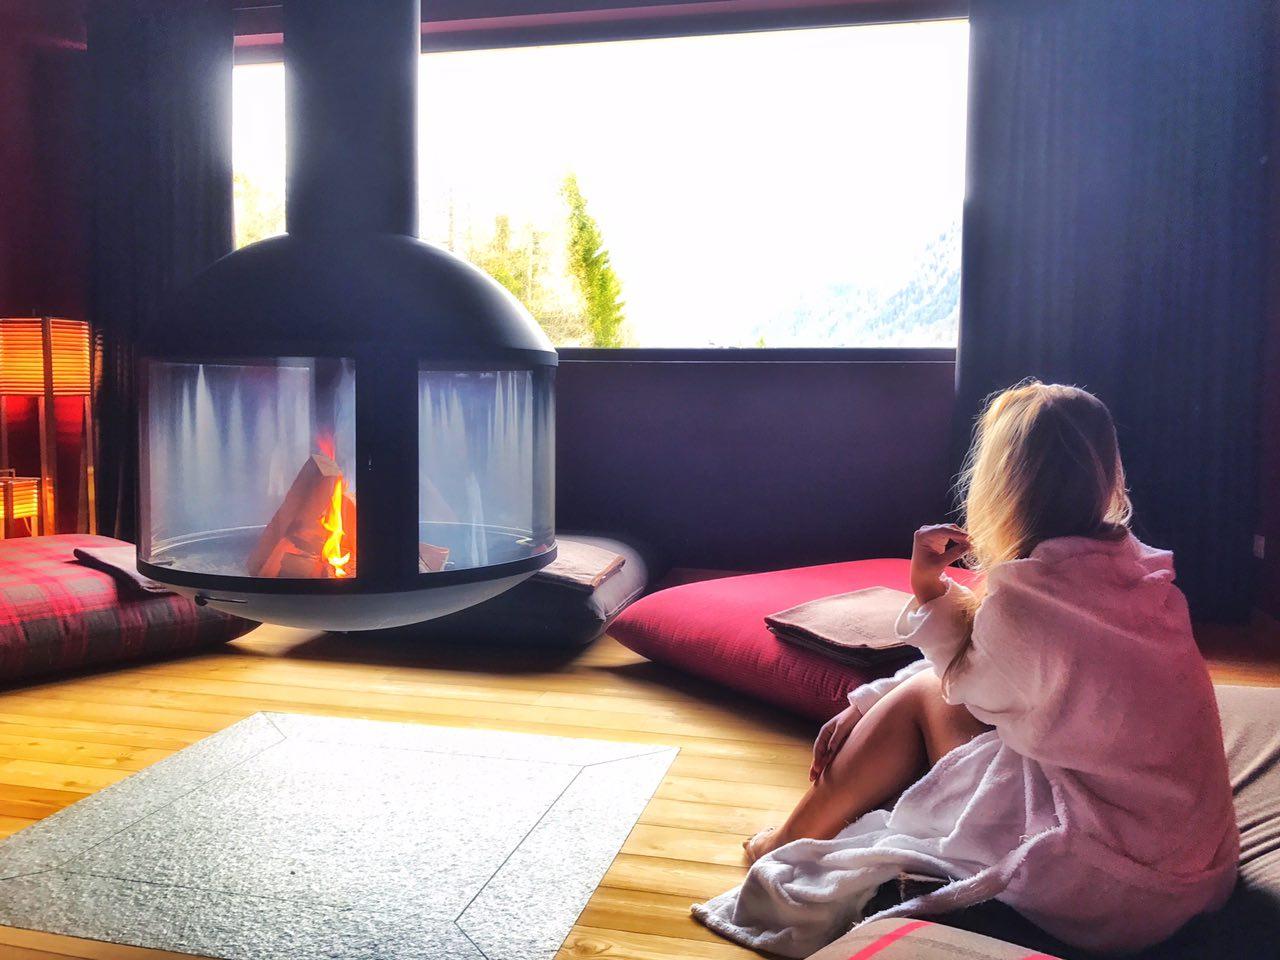 QC Terme Dolomiti sala relax fuoco